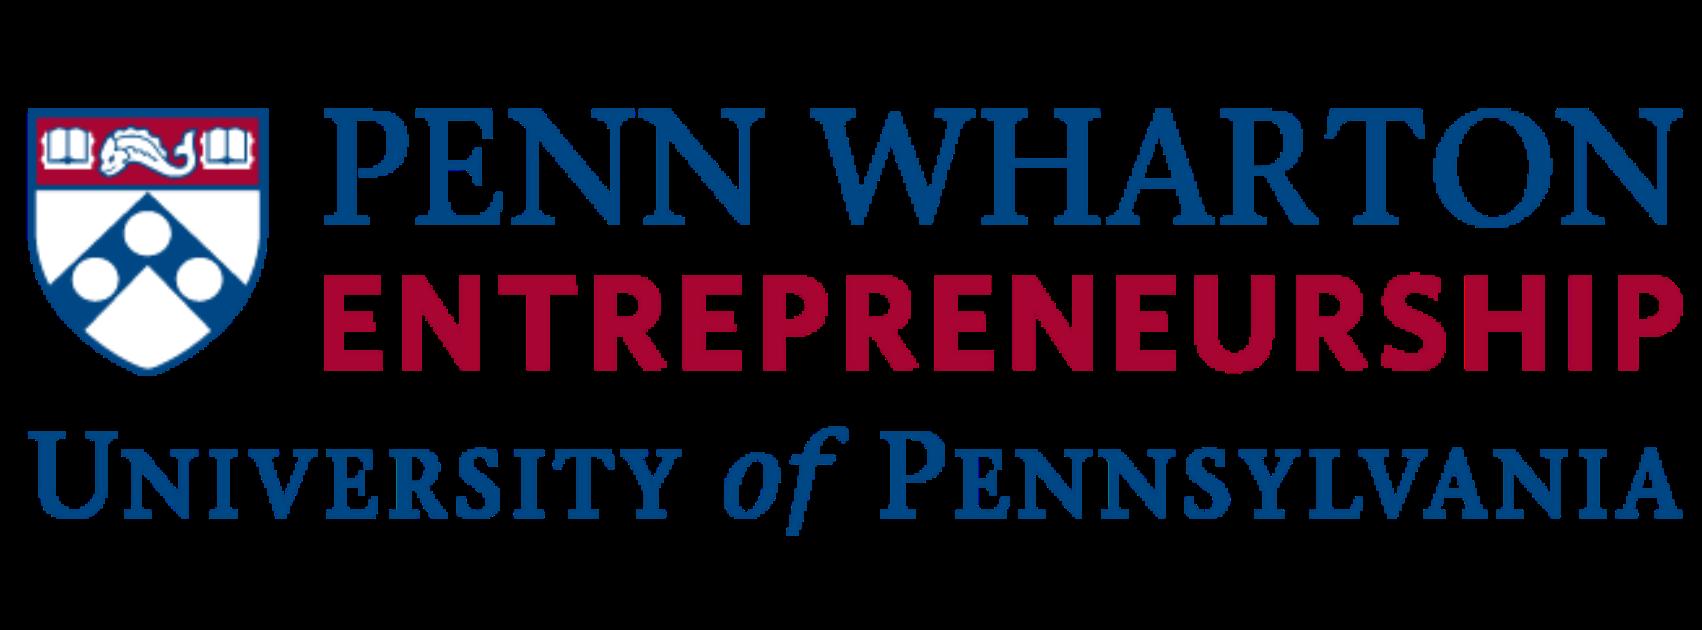 Penn-Wharton Entrepreneurship